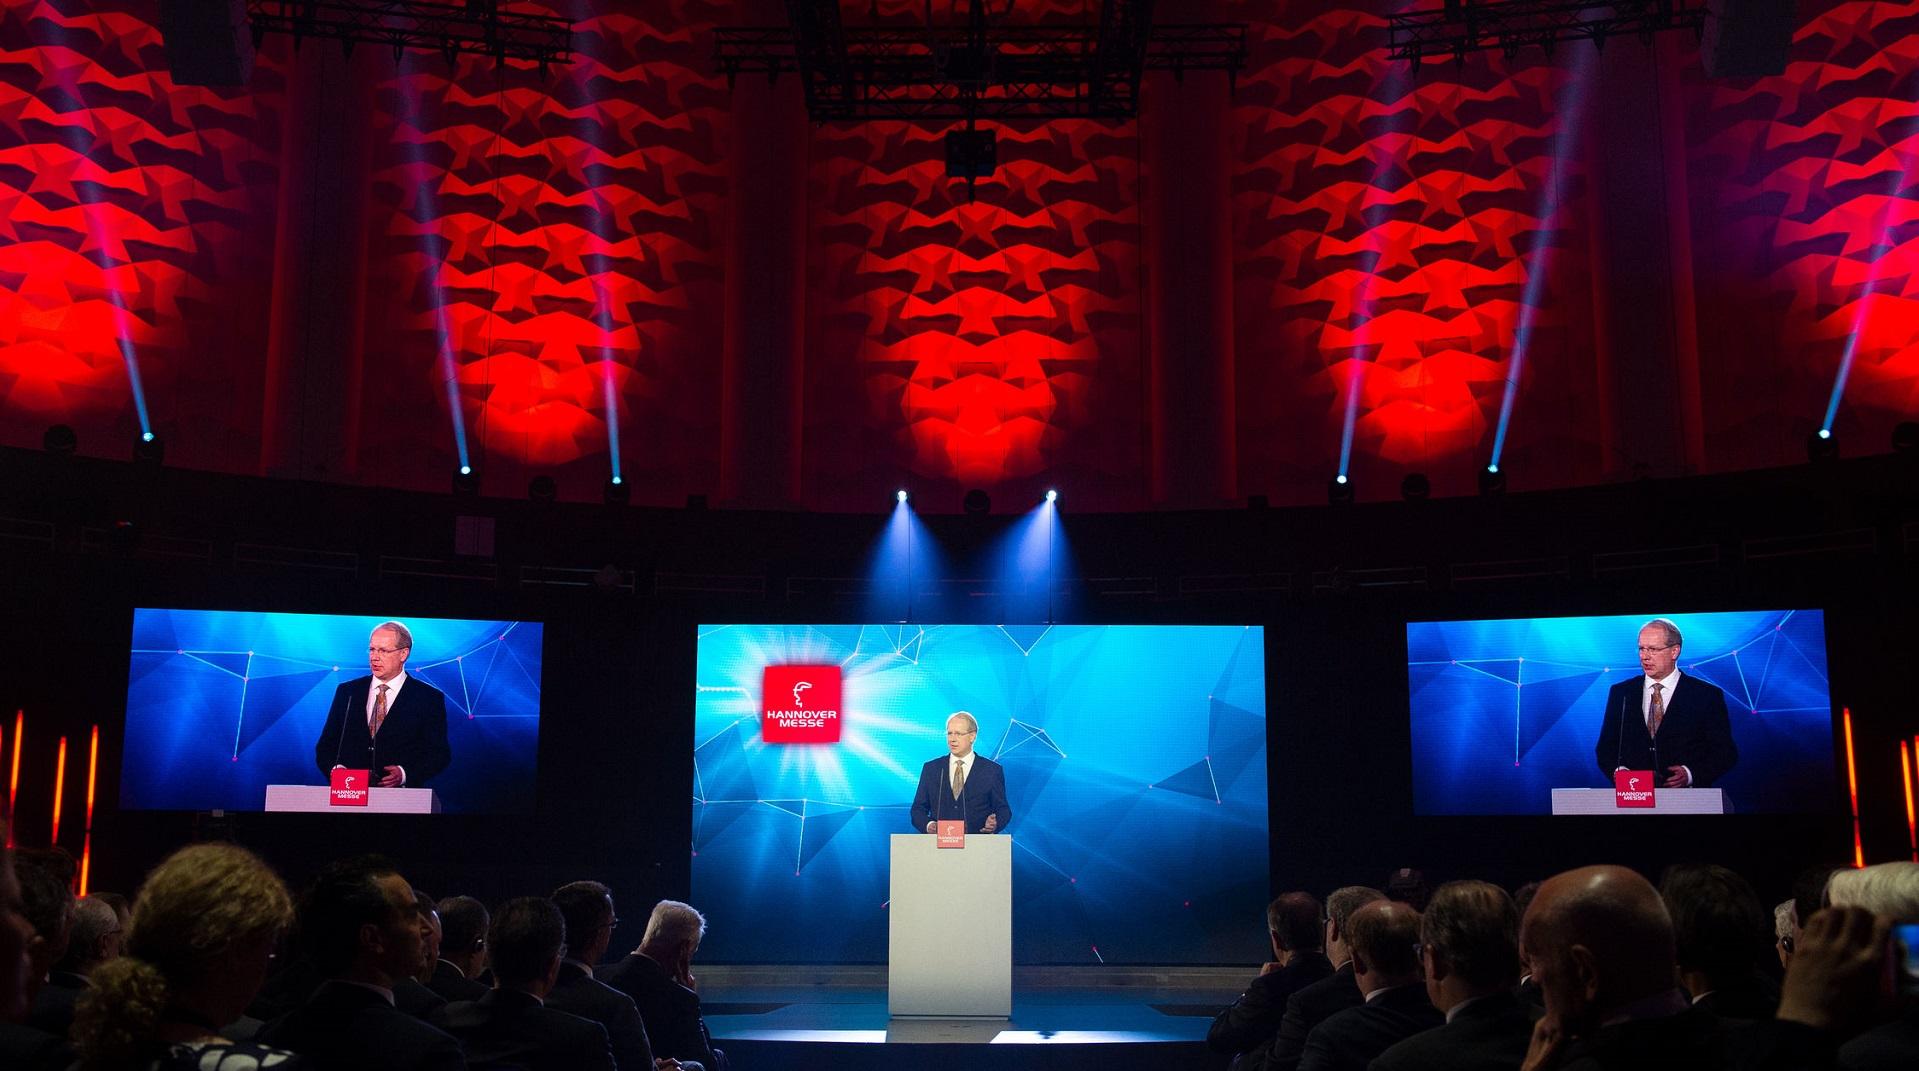 The Industrial Intelligence fair